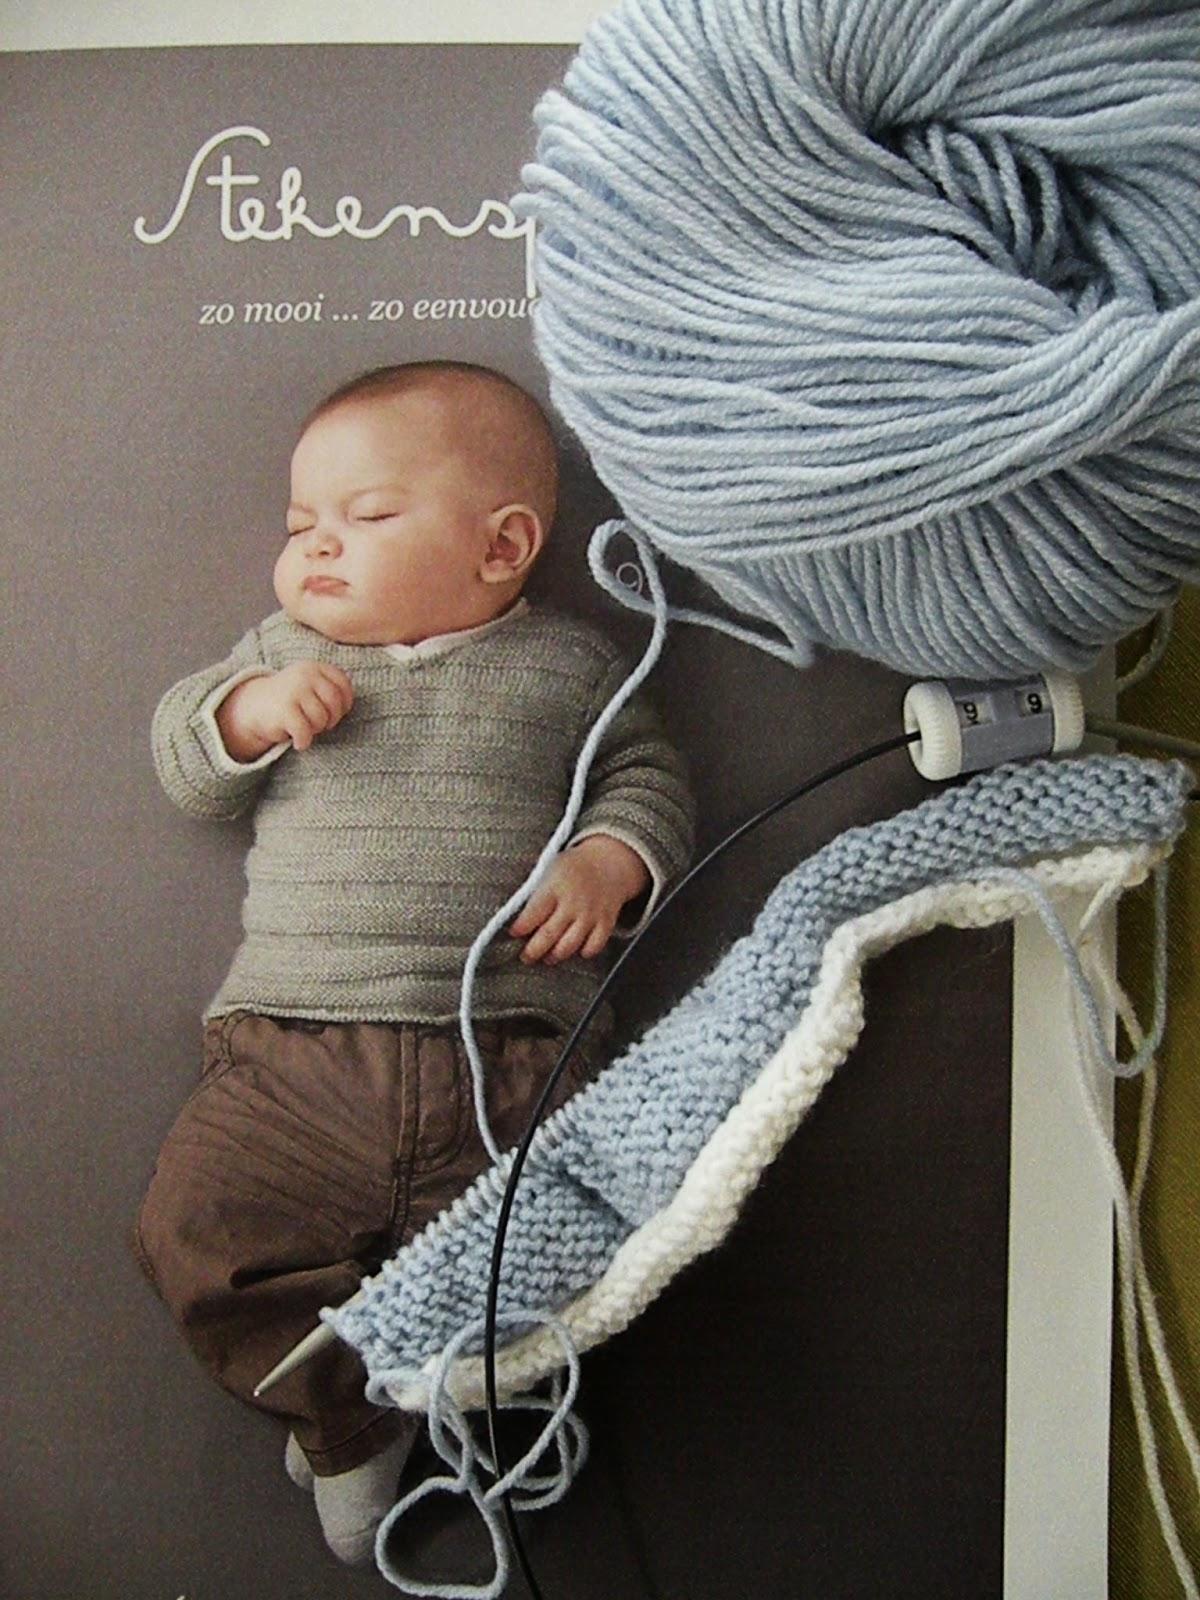 Cuddly baby Maternity Pillow Pregnancy Nursing Sleeping Body Support Feeding K3